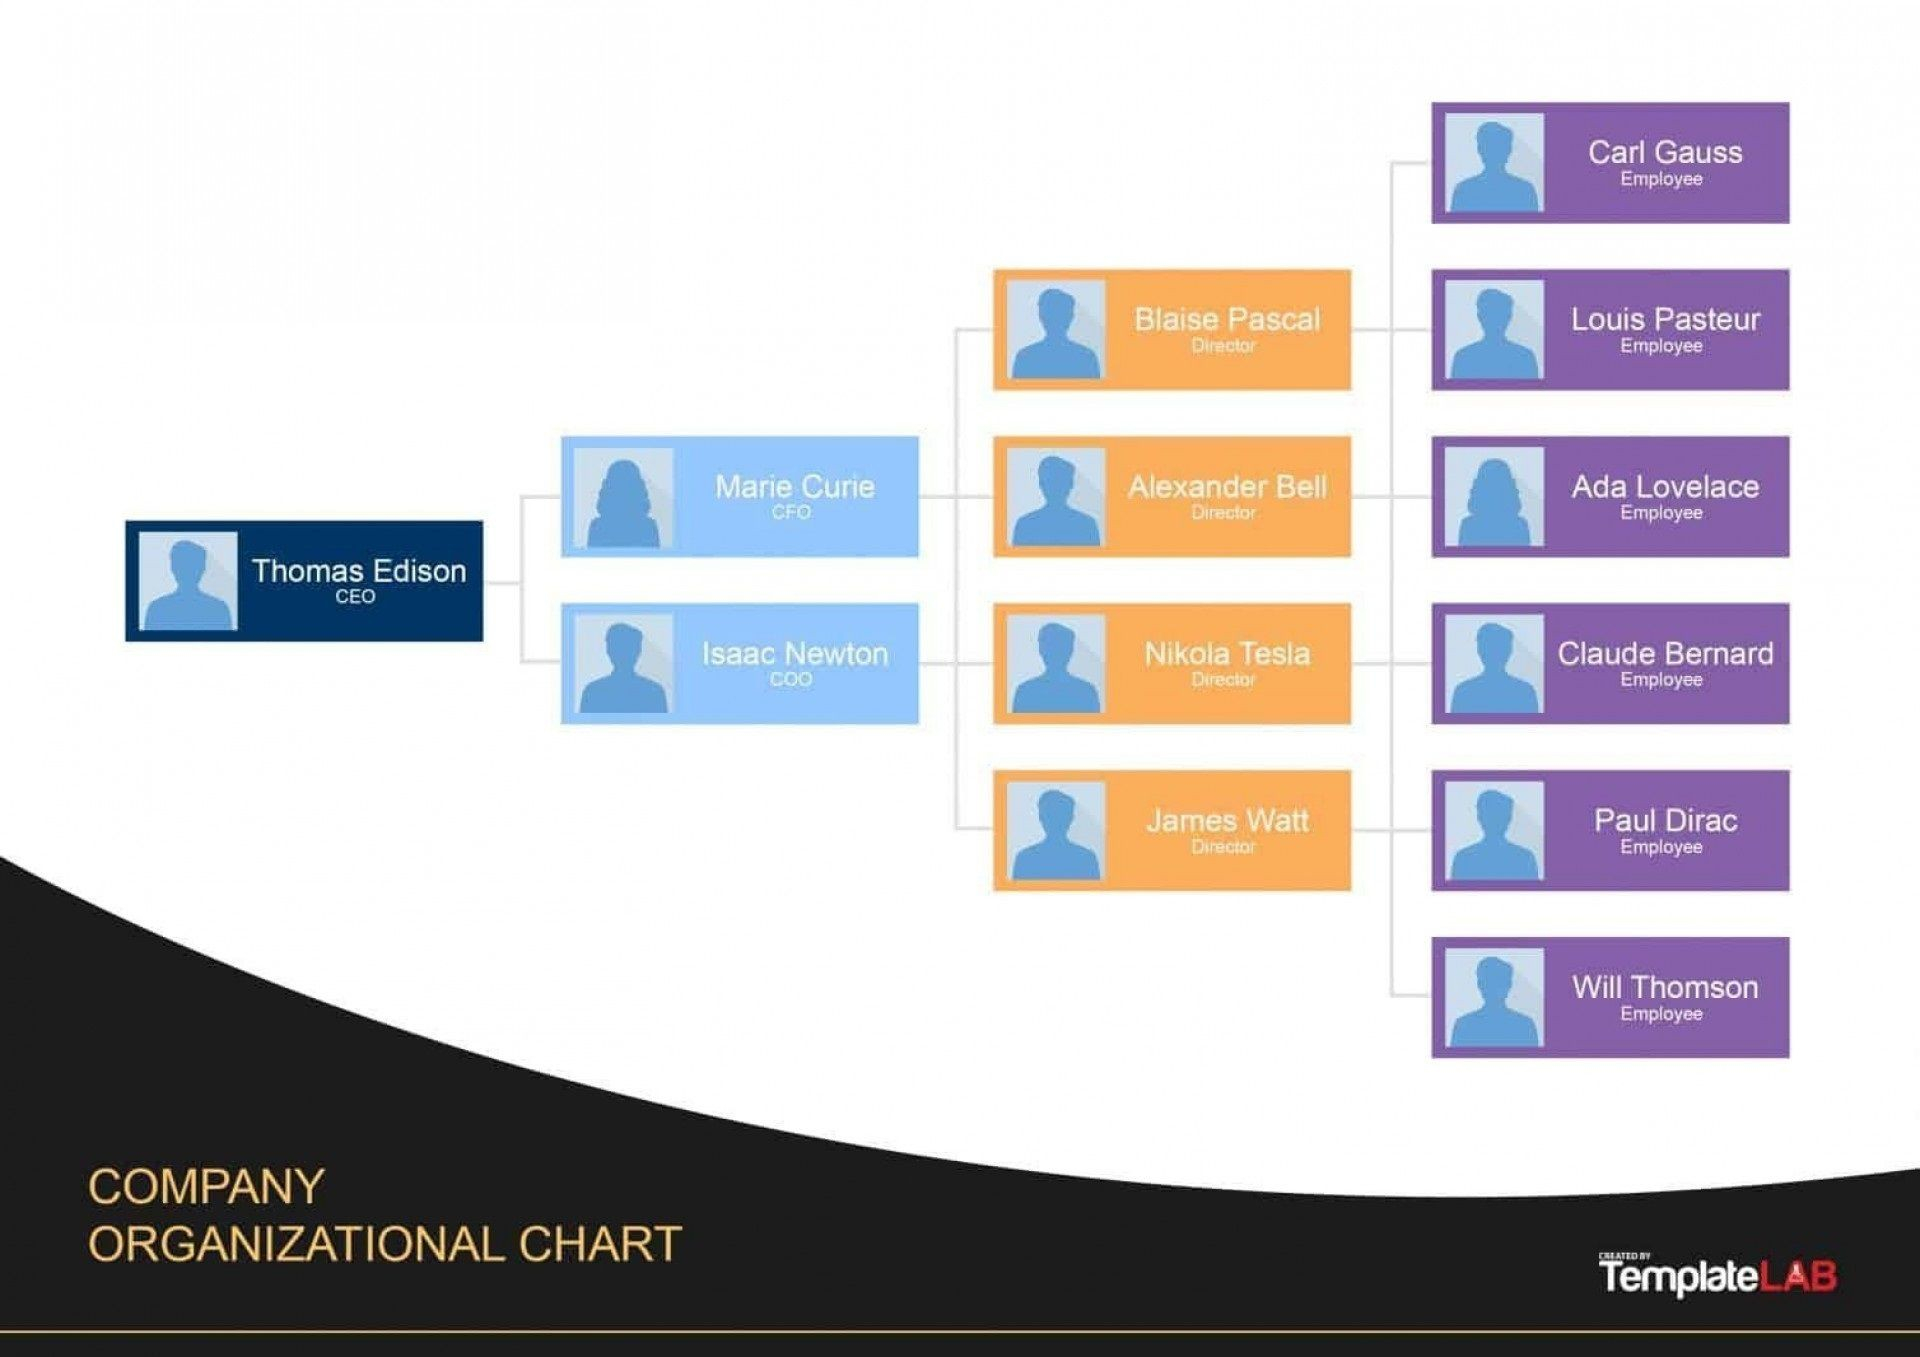 008 Marvelou Organization Chart Template Word 2013 Inspiration  Organizational Free In Microsoft1920